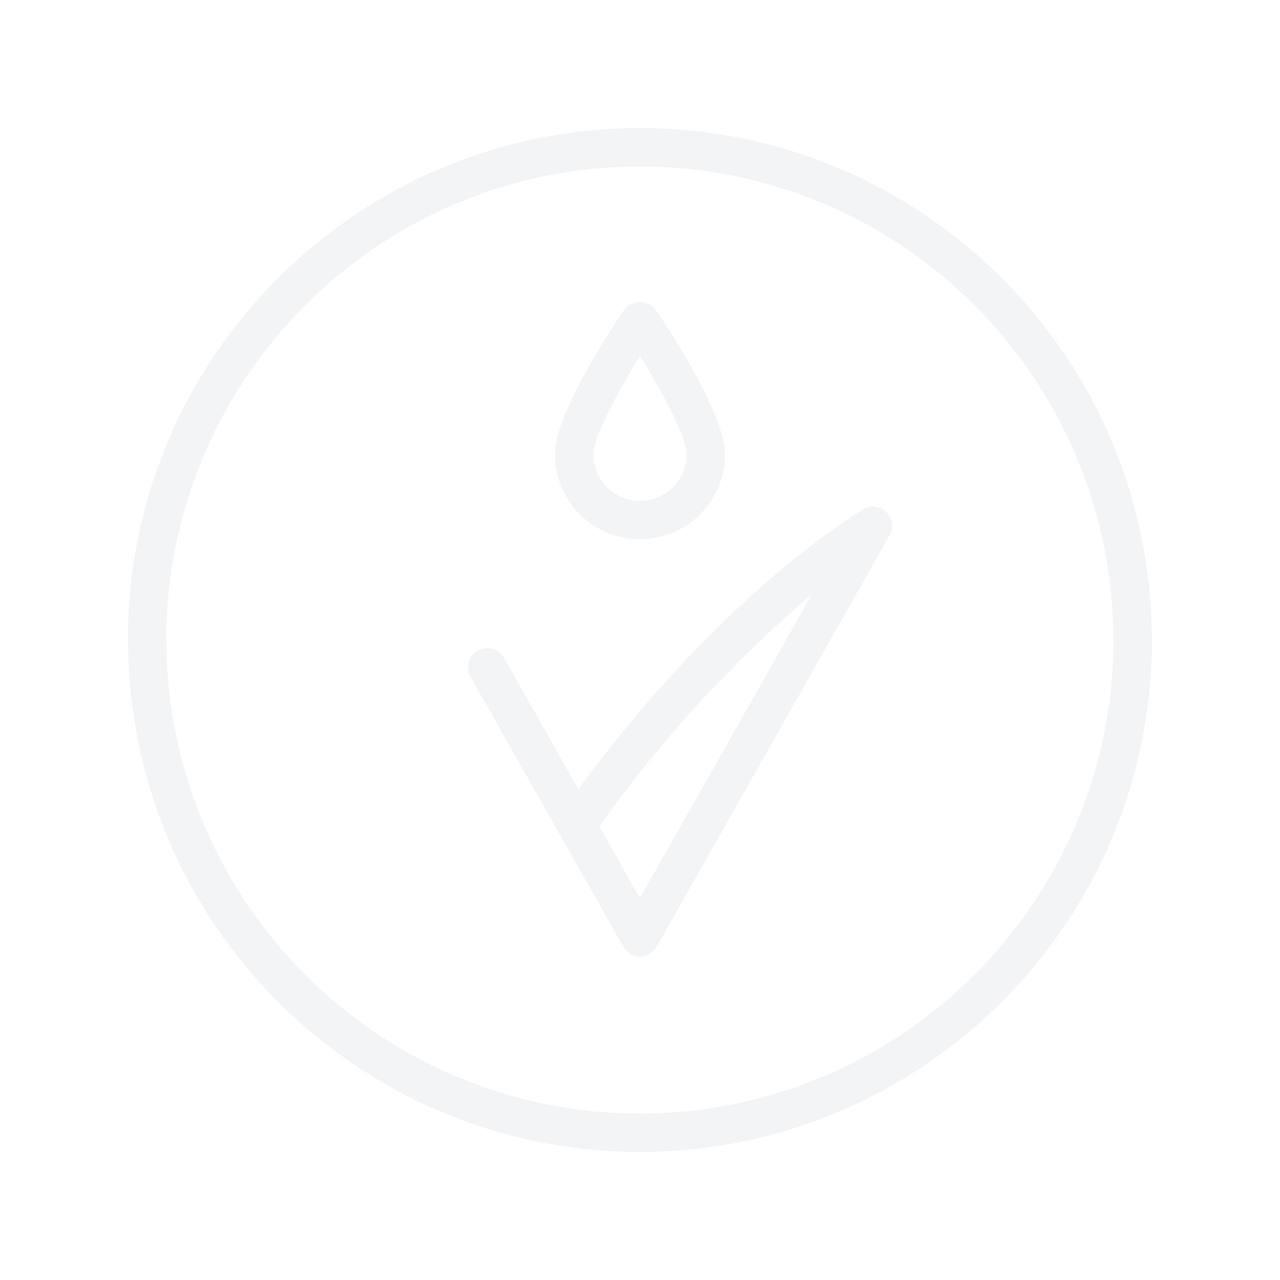 MAKEUP REVOLUTION Freedom Pro 12 Eyeshadow Palette 12g